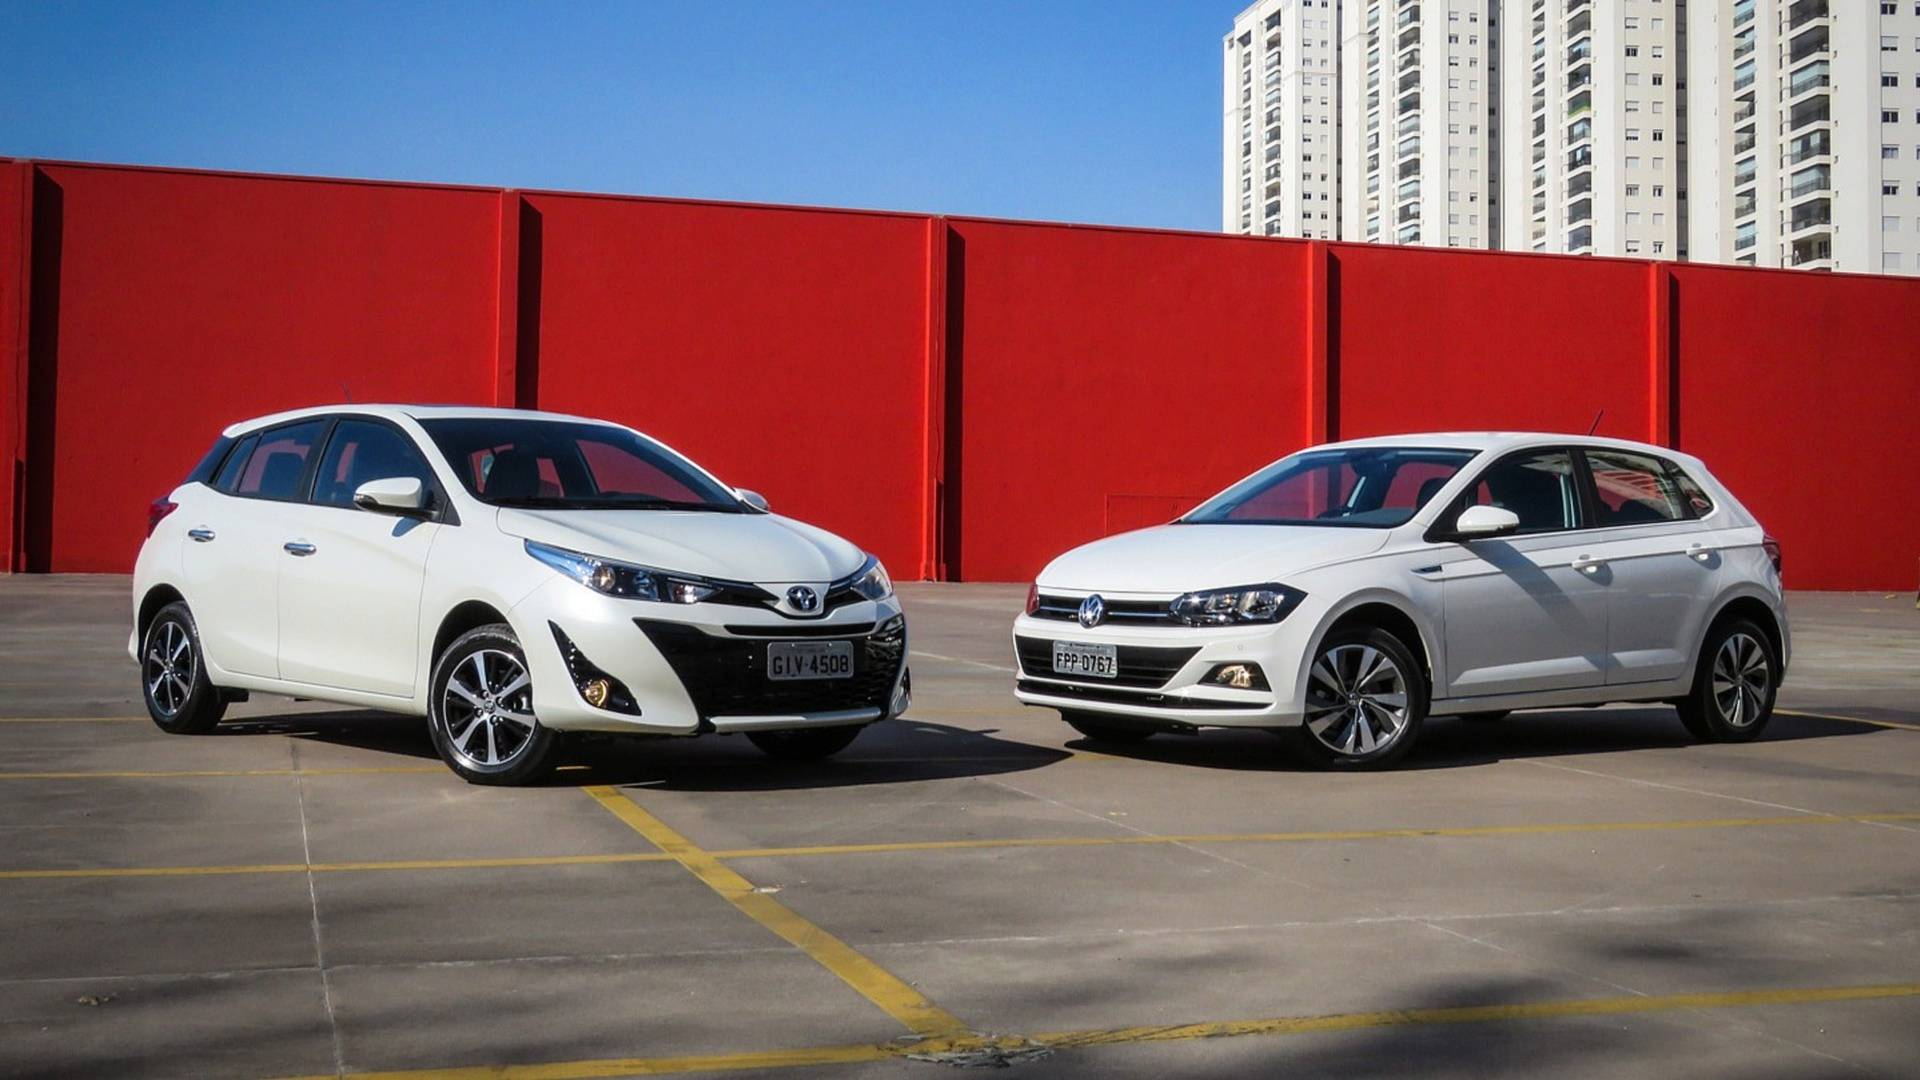 f5194b39a5 Comparativo Toyota Yaris XS x VW Polo Comfortline  Questão de referência